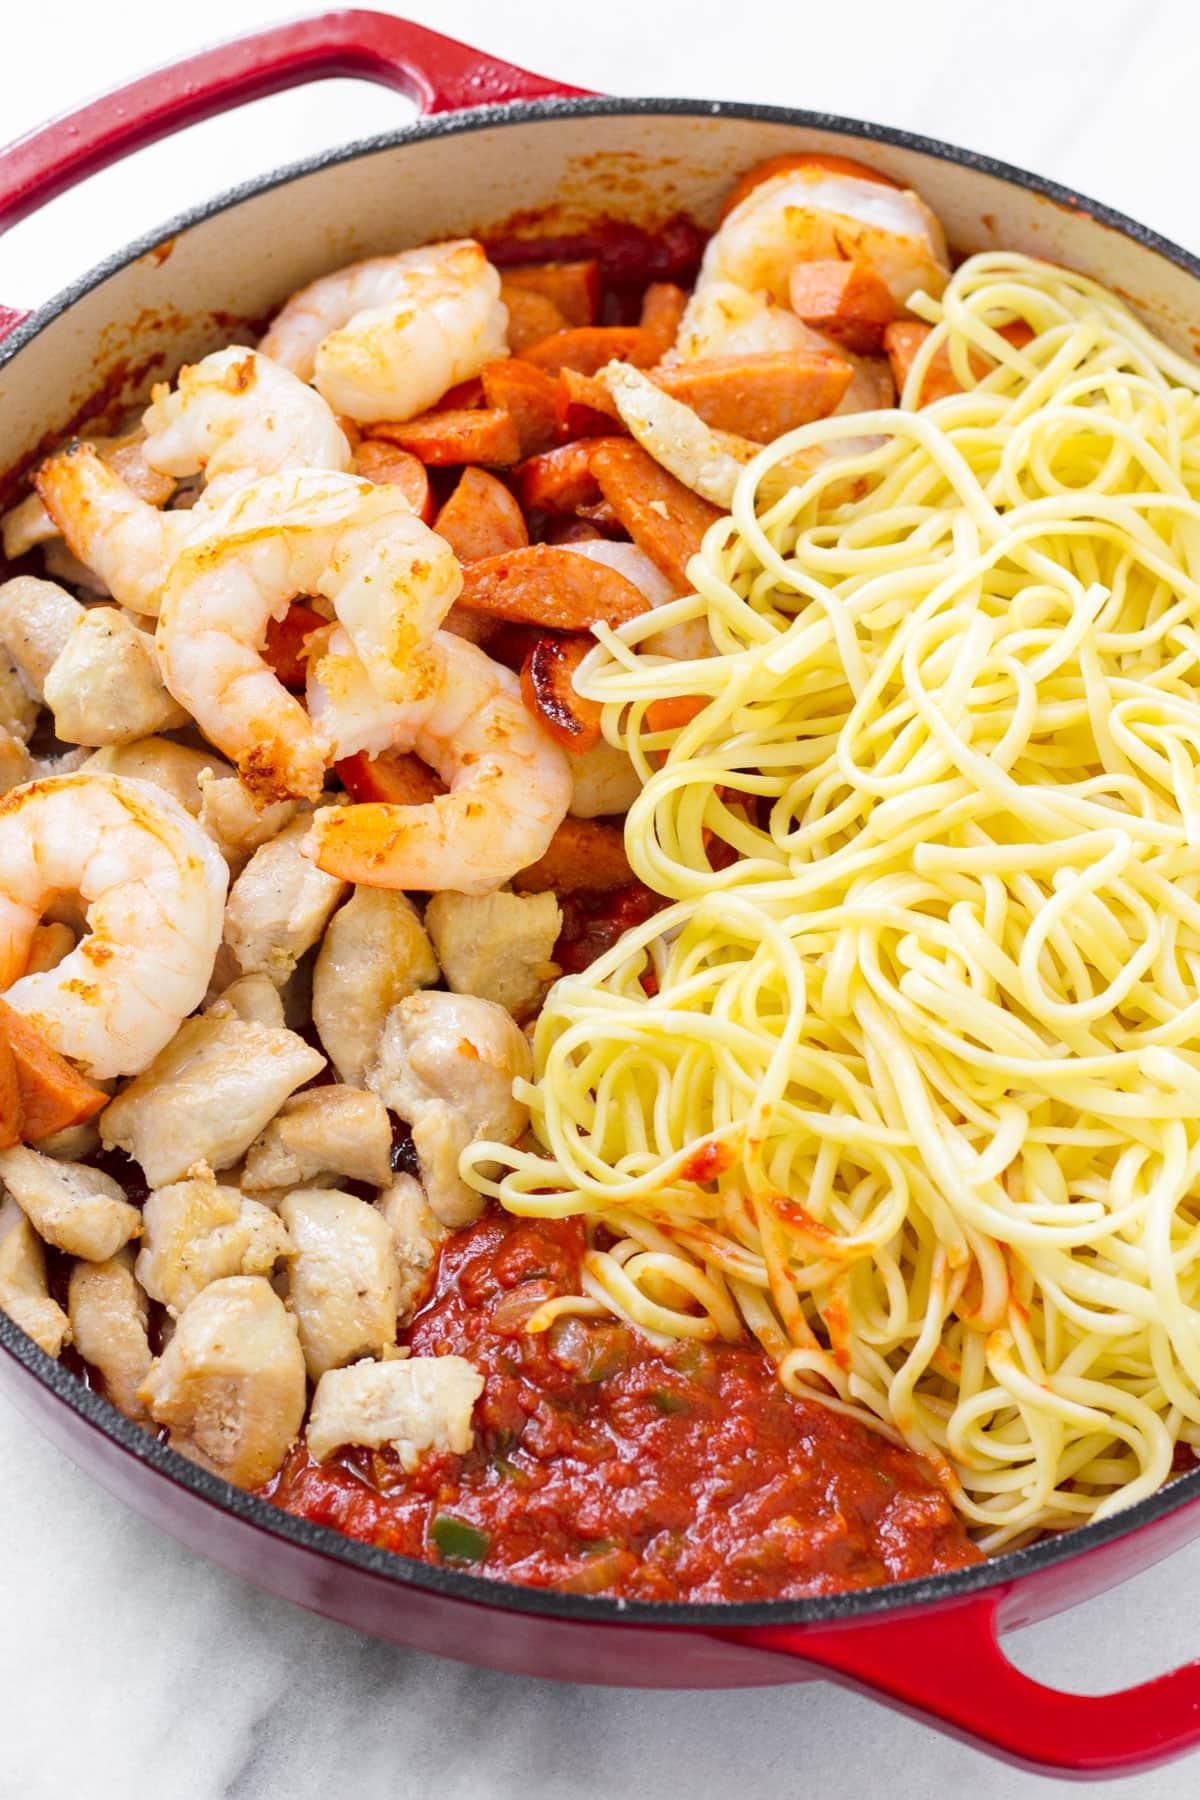 jambalaya pasta ingredients arranged in a pot, including chicken, shrimp, sausage, sauce, and pasta